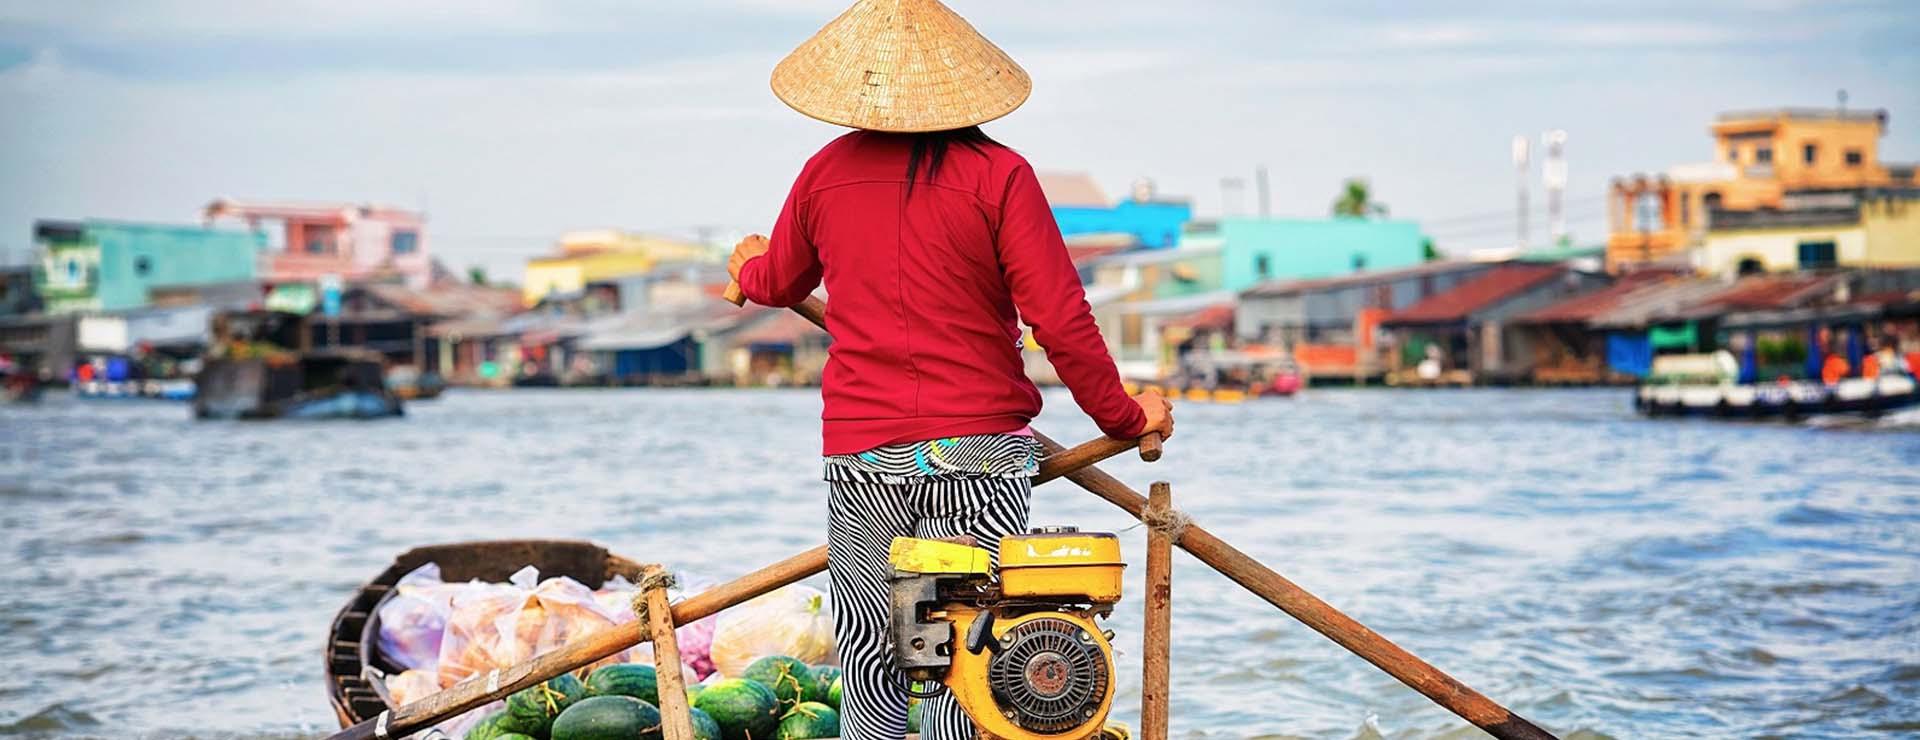 Lo más espectacular del Delta del Mekong de Vietnam